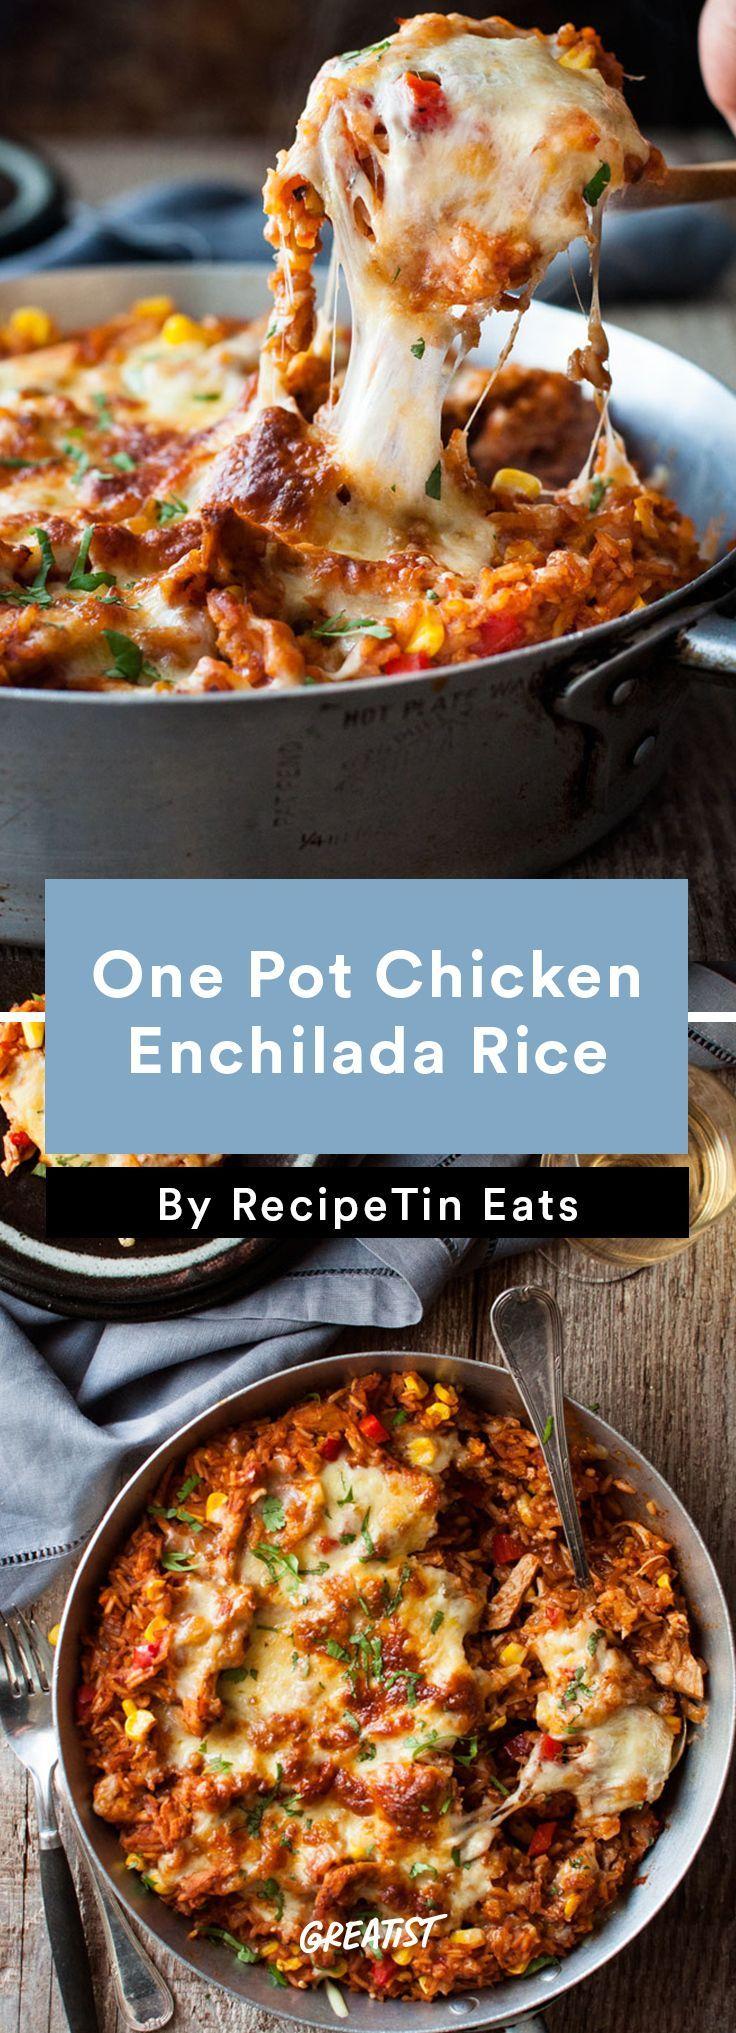 6. Chicken Enchilada Rice #healthy #chicken #recipes http://greatist.com/eat/easy-chicken-recipes-one-dish-dinner-ideas                                                                                                                                                     More